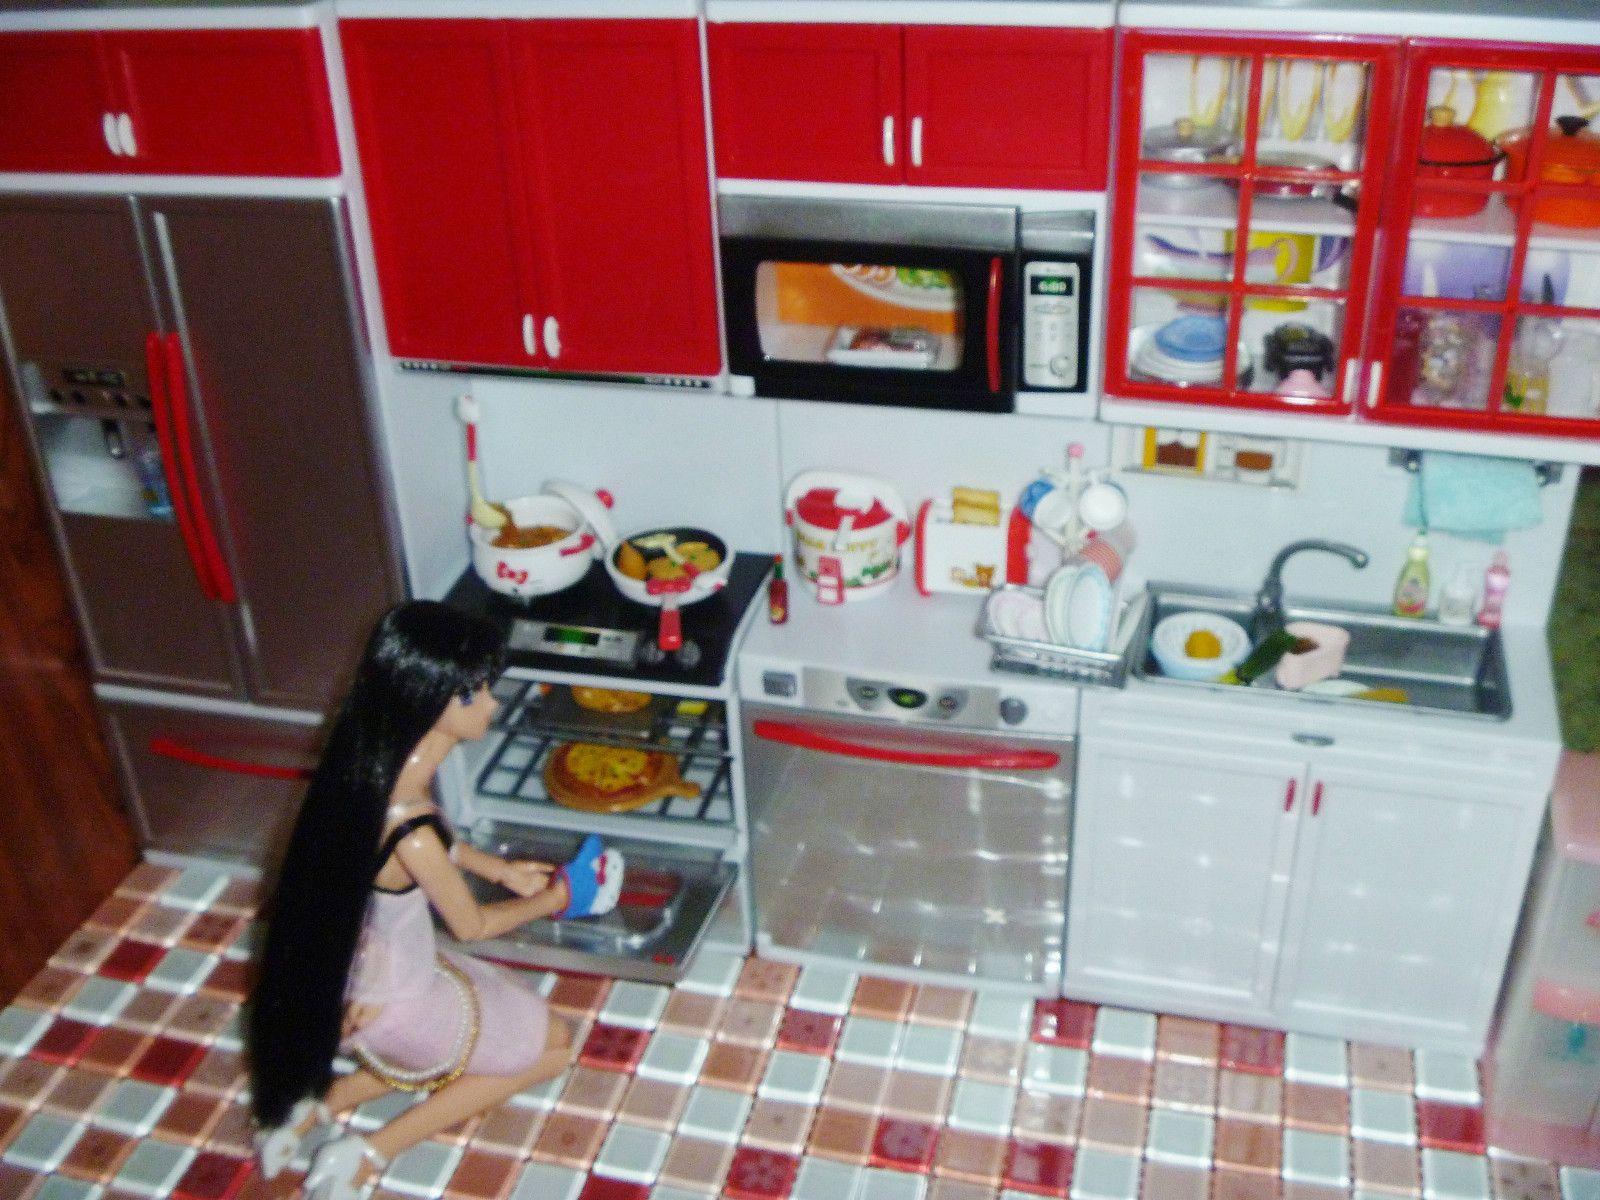 Miniature Modern Comfort kitchen set Rement-Like 4 Blythe,Licca ...